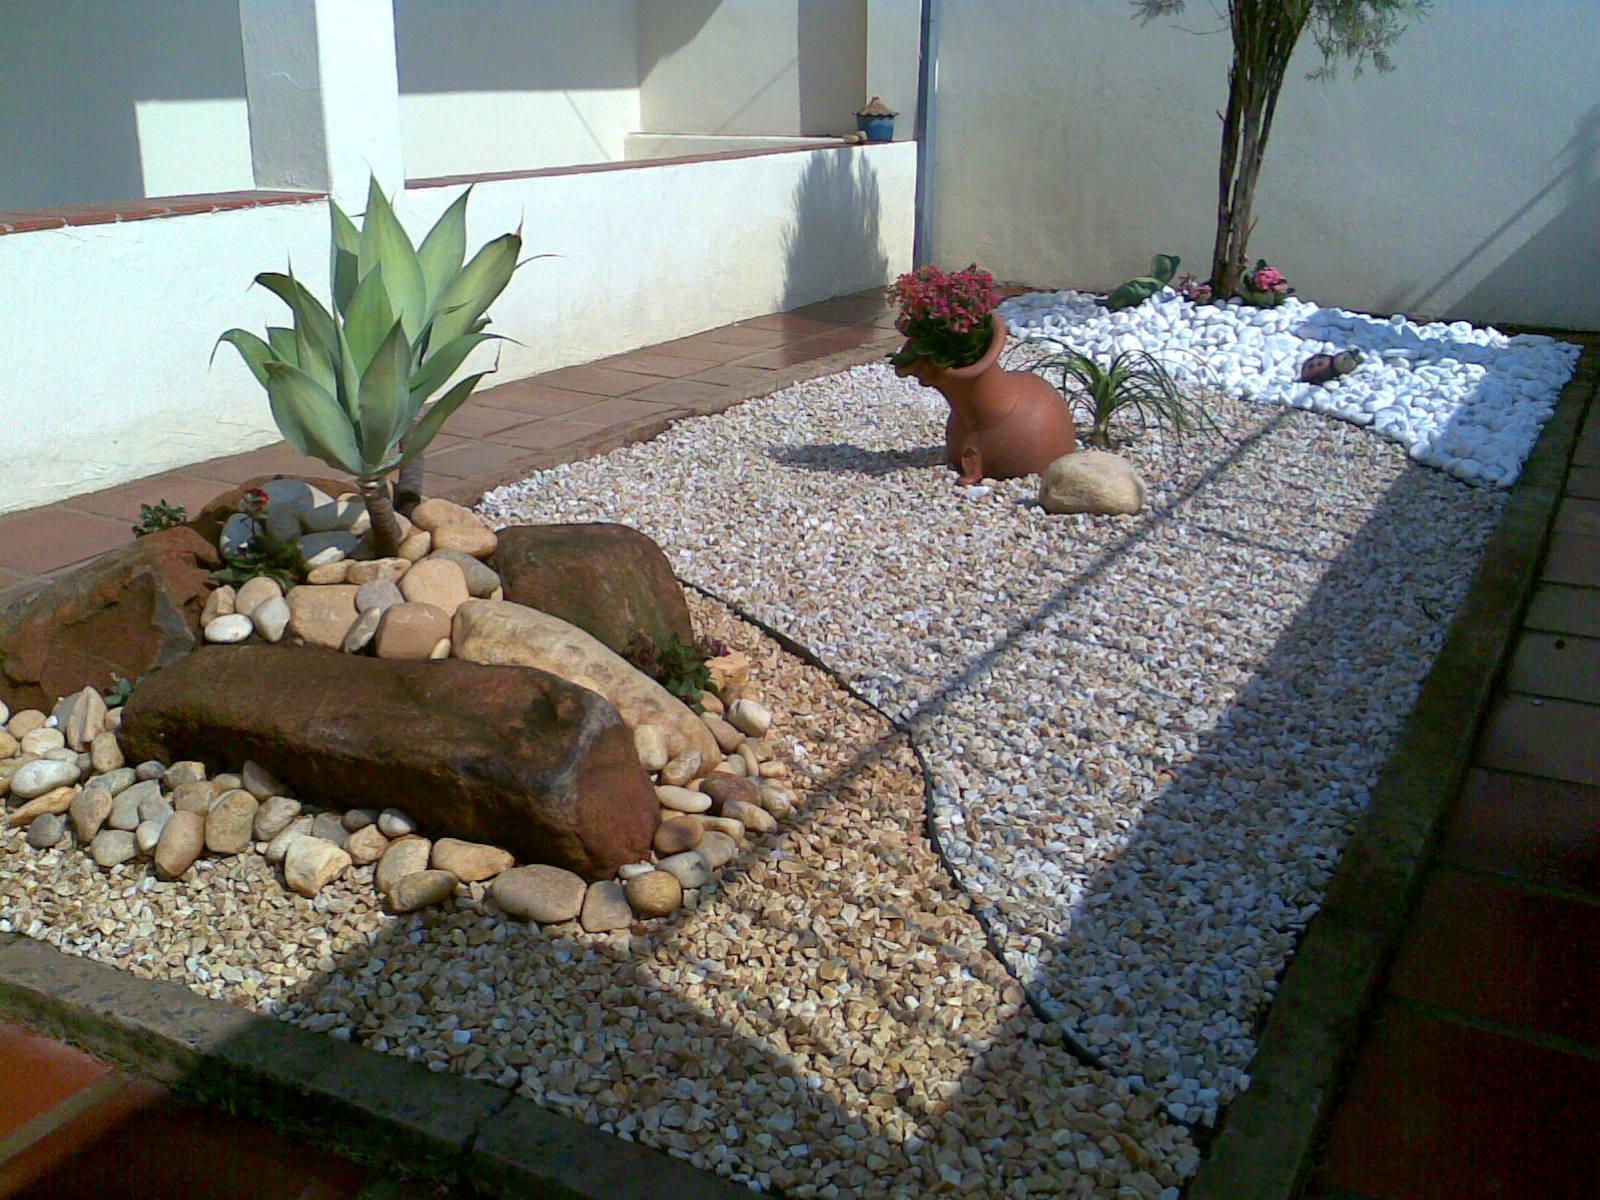 pedras para jardim mais baratasJardinagem e Paisagismo Jardim de